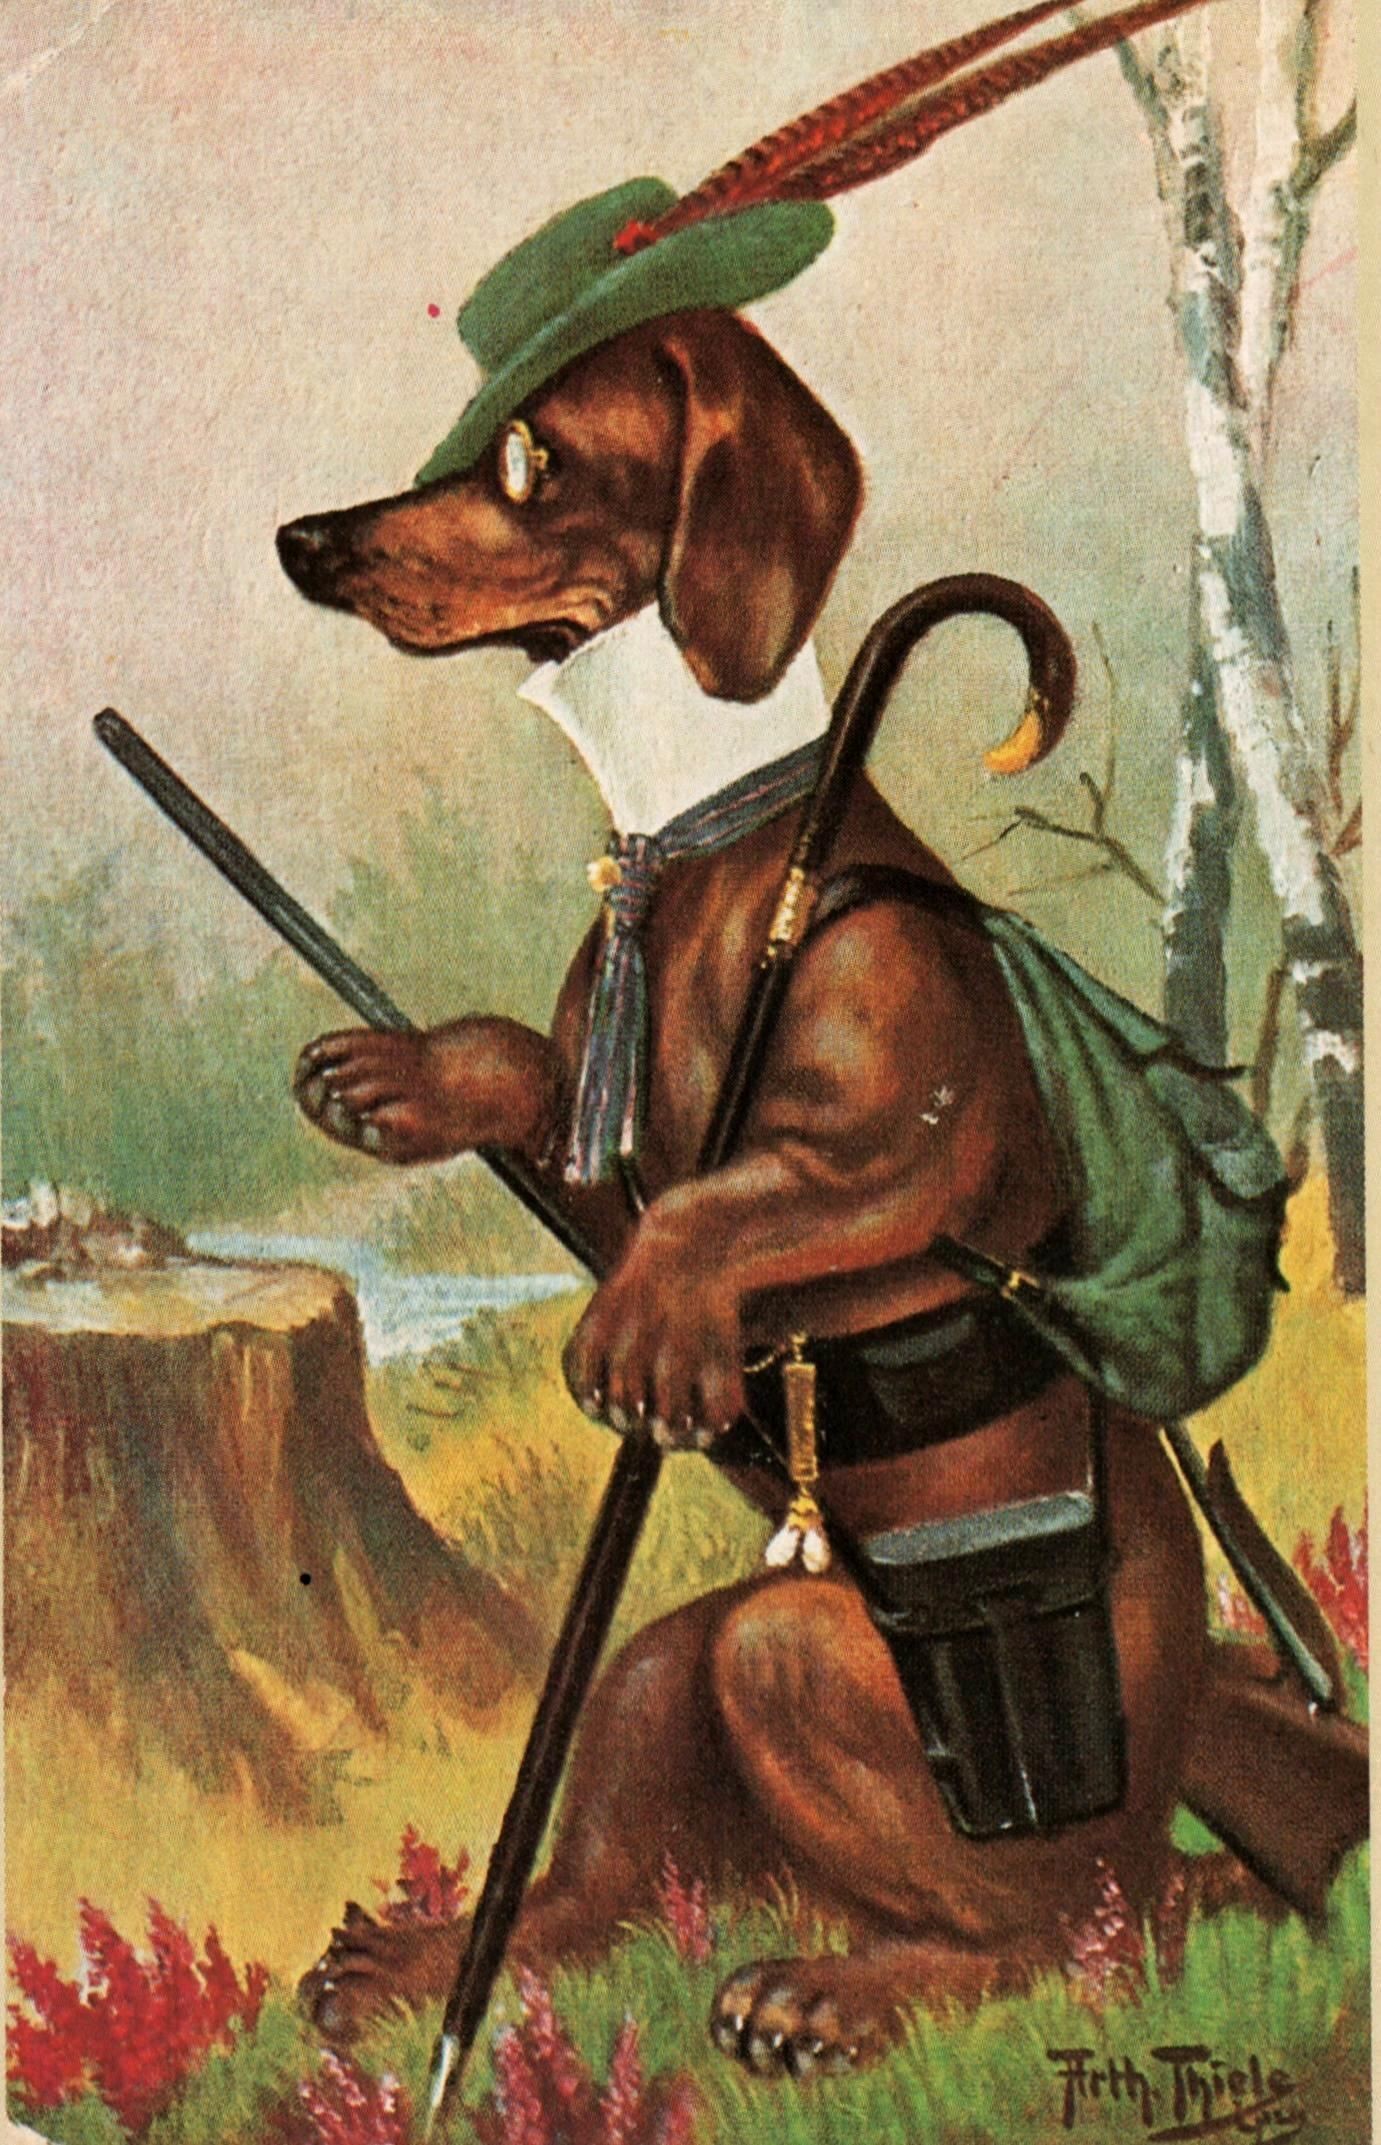 Arthur Thiele Ill Pc Dog Hunter B 42234369955 O Dogs Vintage